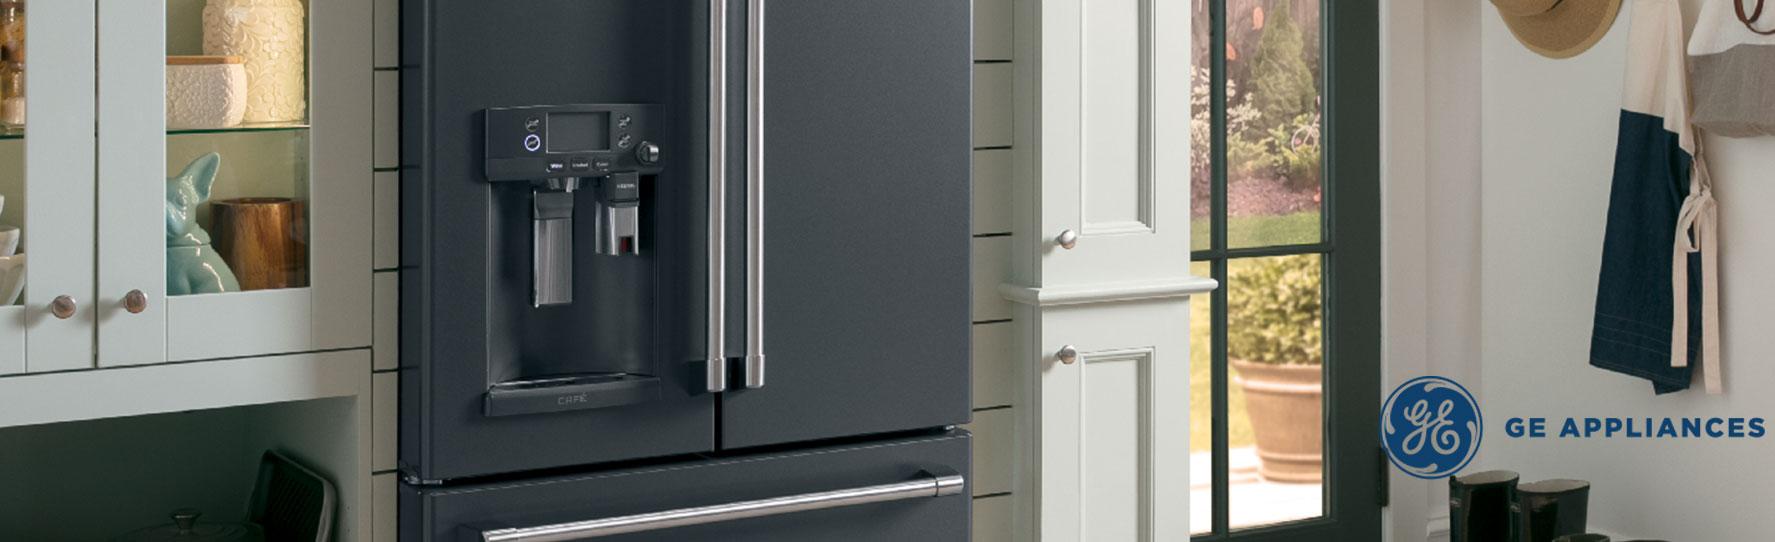 Refrigerators - Standard TV & Appliance